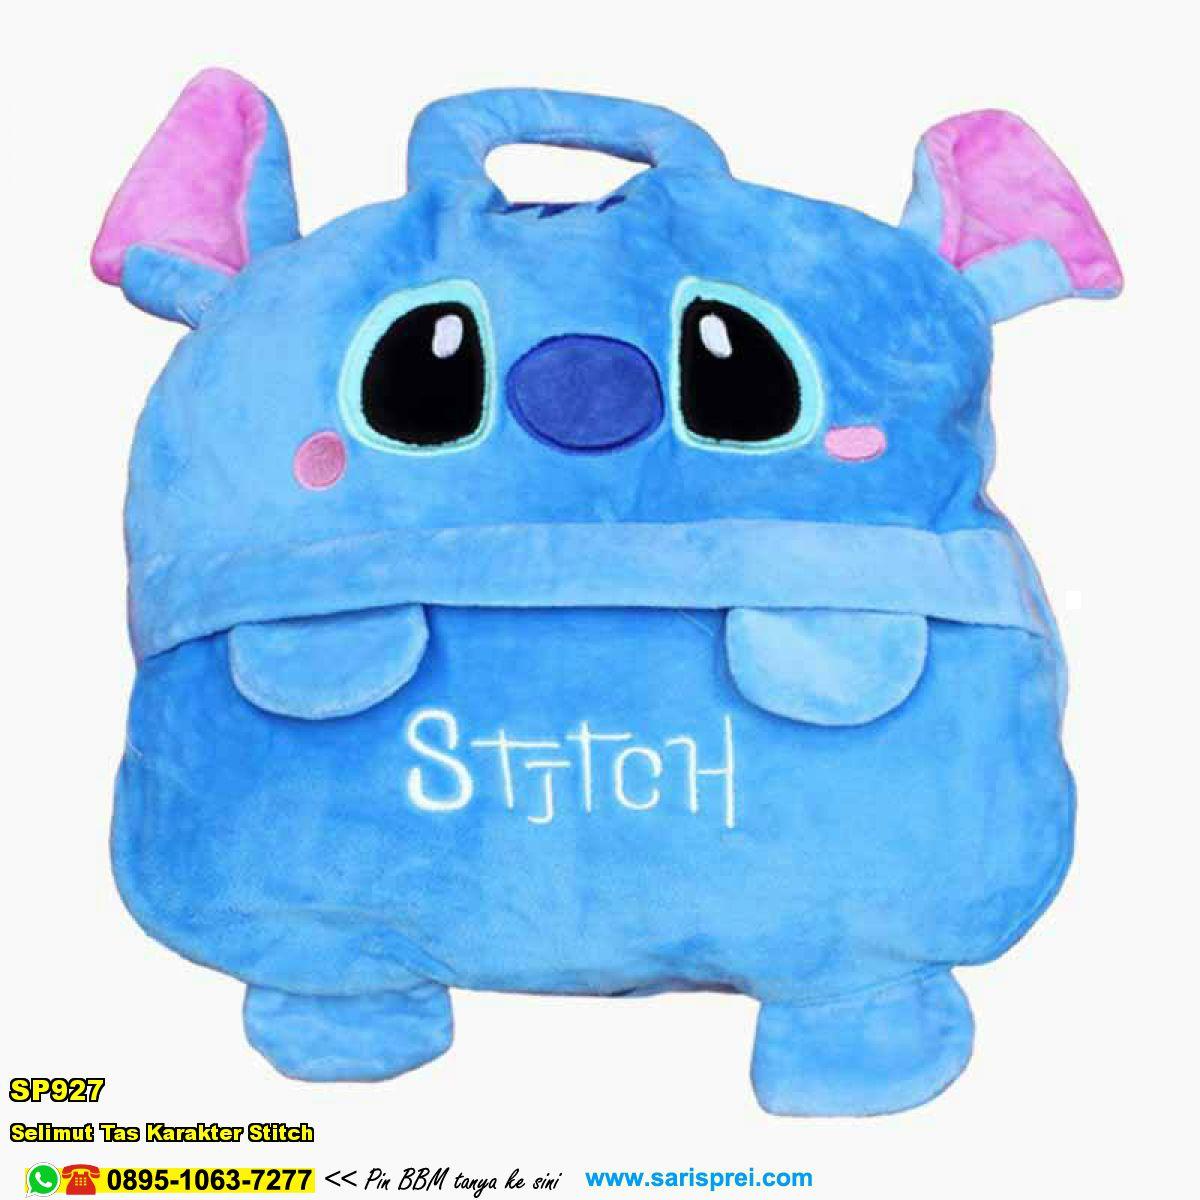 Grosir Sprei Cantik Selimut Tas Karakter Stitch Biru Ungu Kartun Diposting Oleh Desainer Dani Craft Uut Di 0116